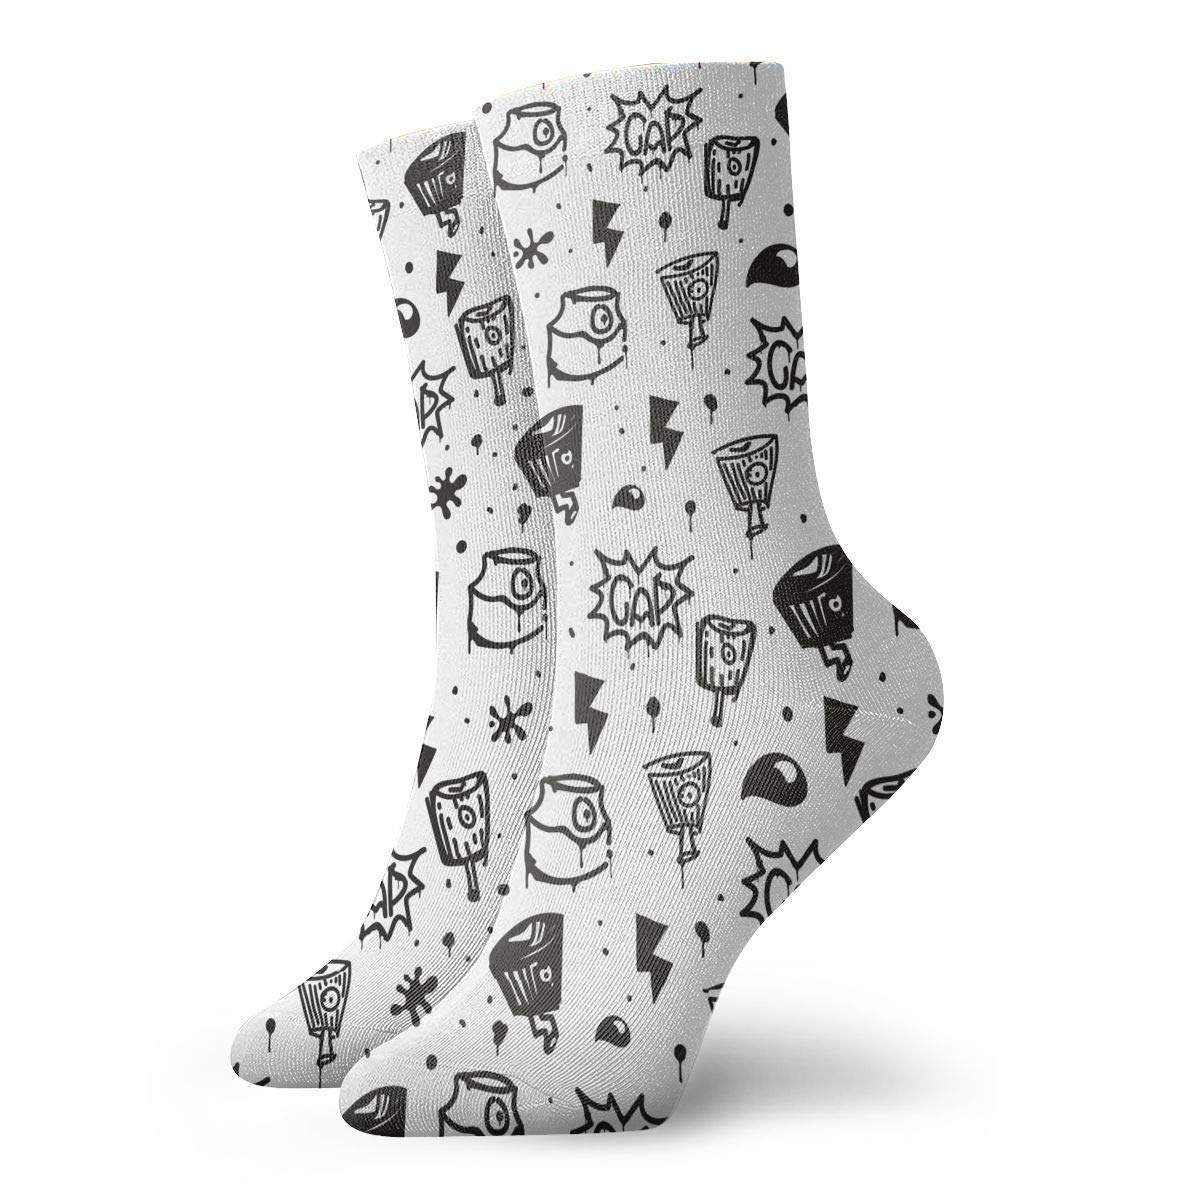 Unisex Graffiti Image Athletic Quarter Ankle Print Breathable Hiking Running Socks